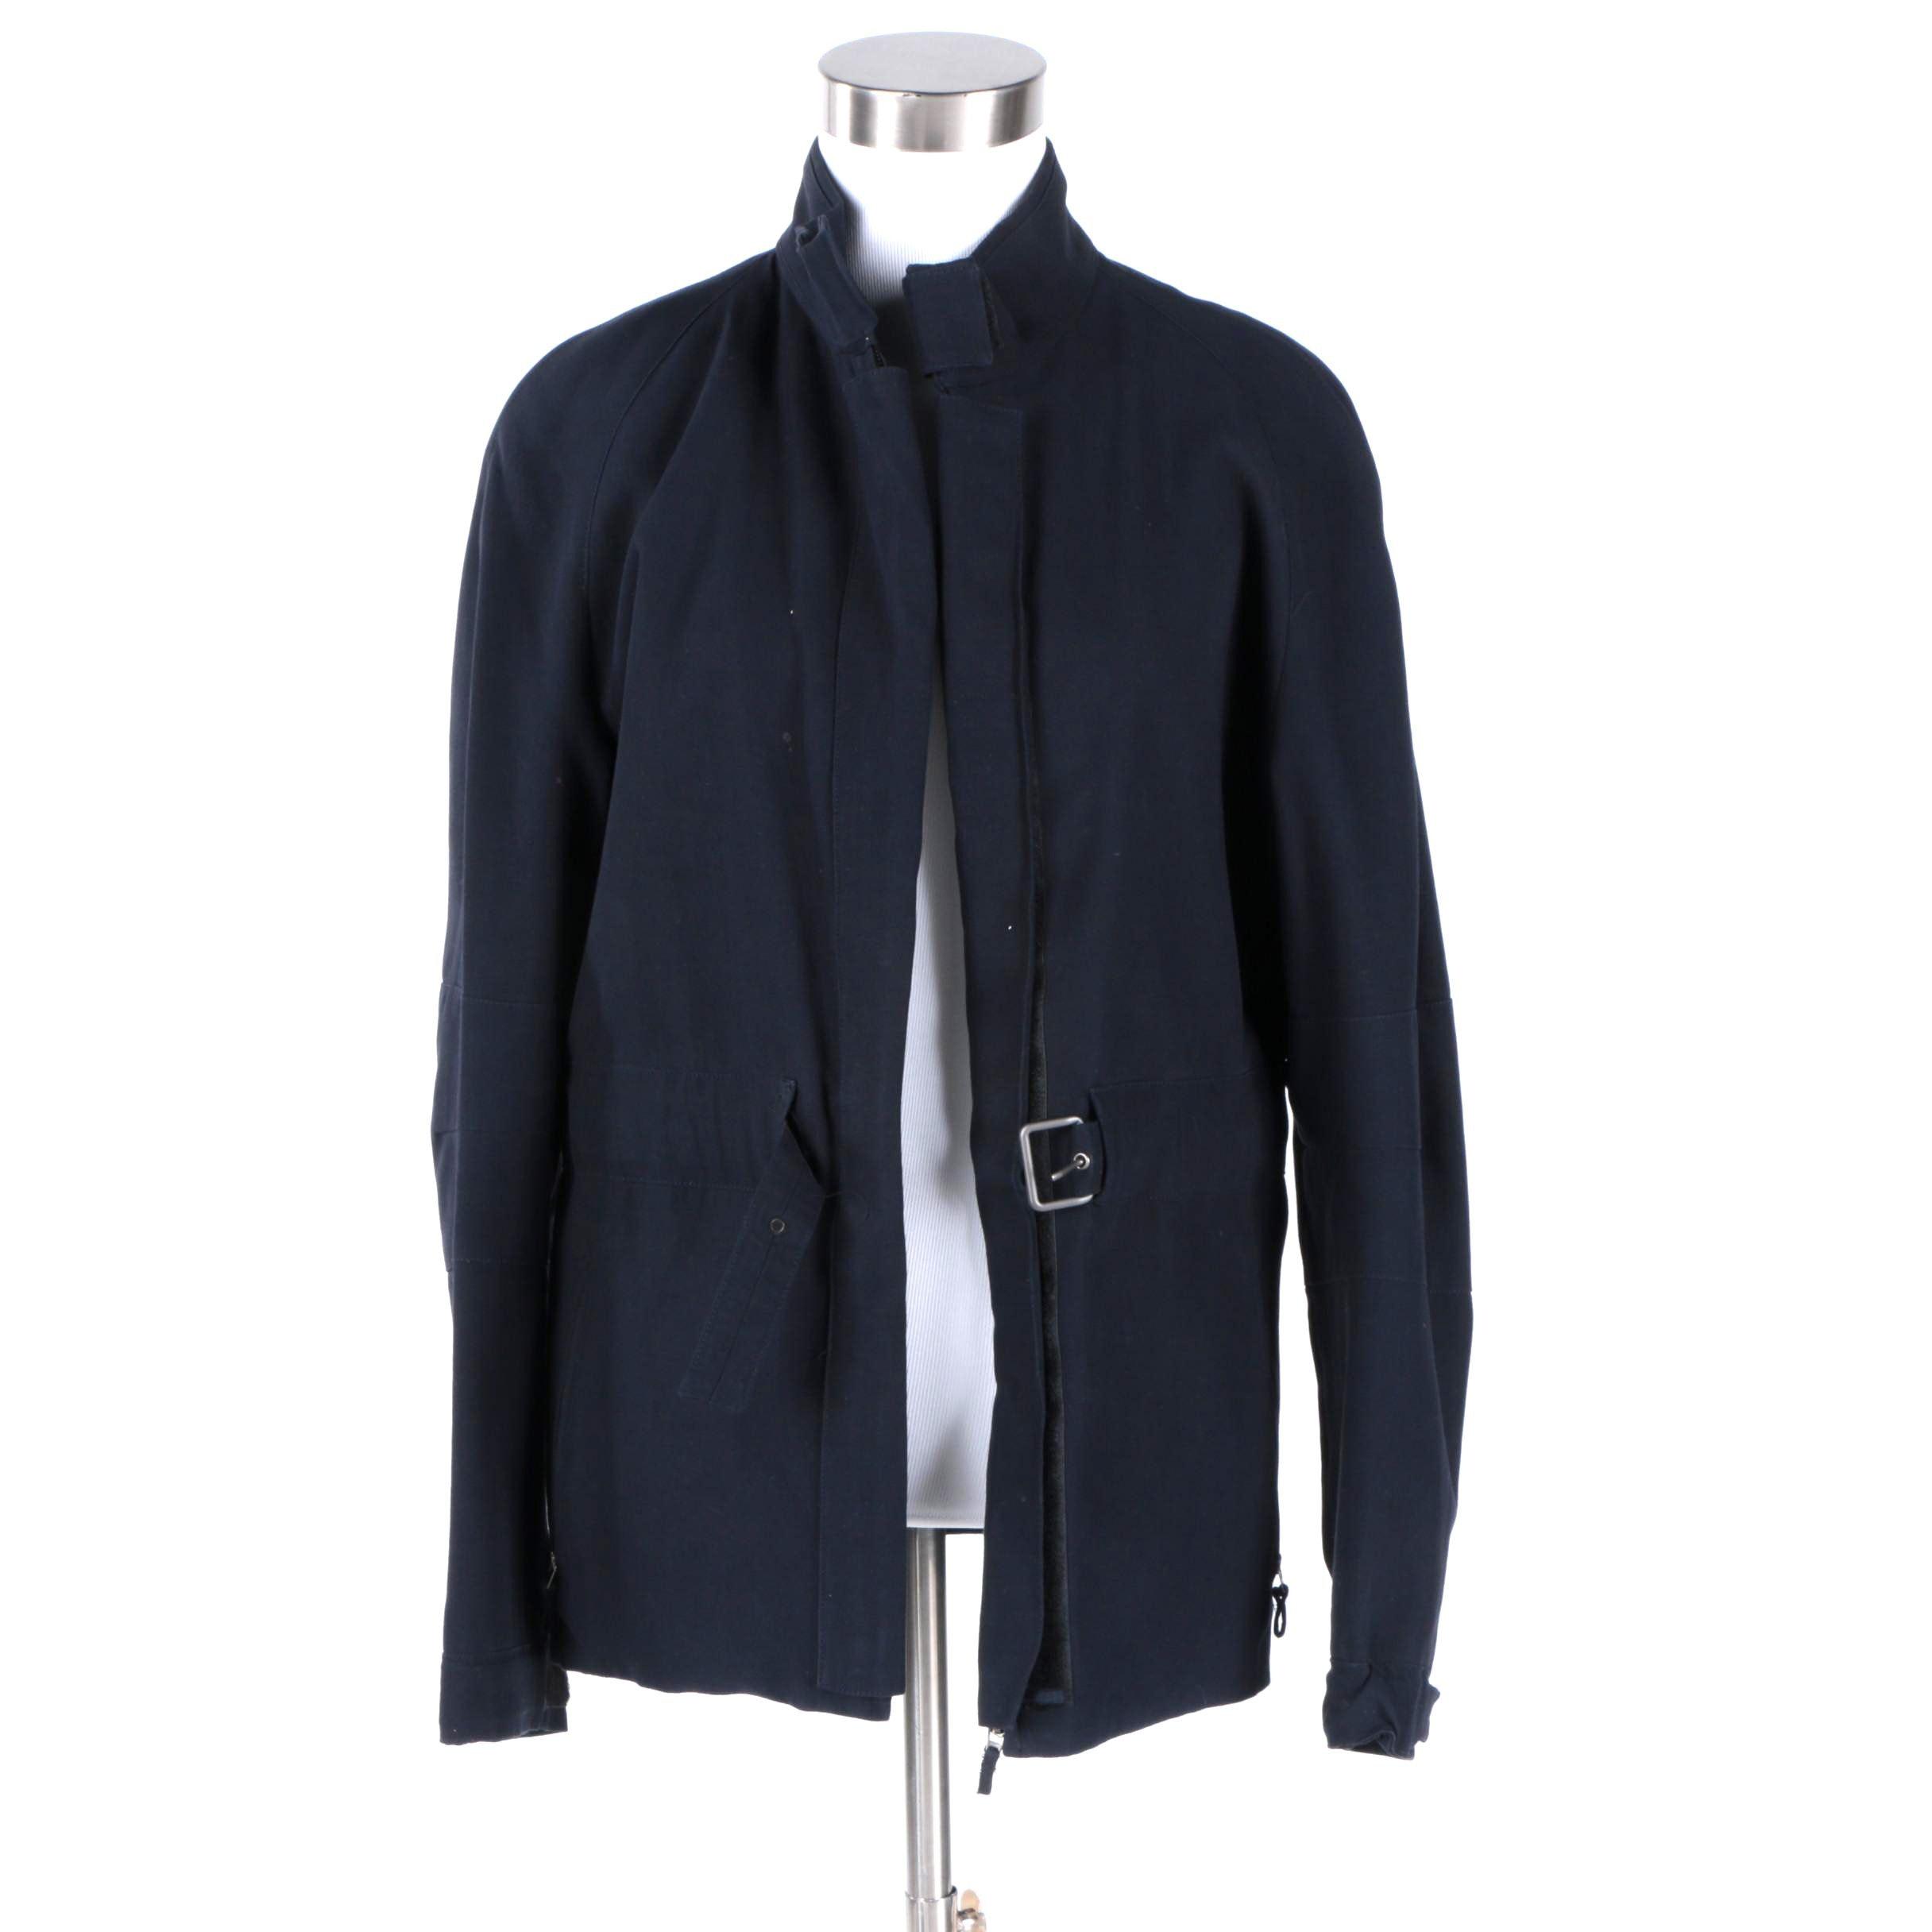 Women's Burberry Prorsum Navy Cotton Jacket